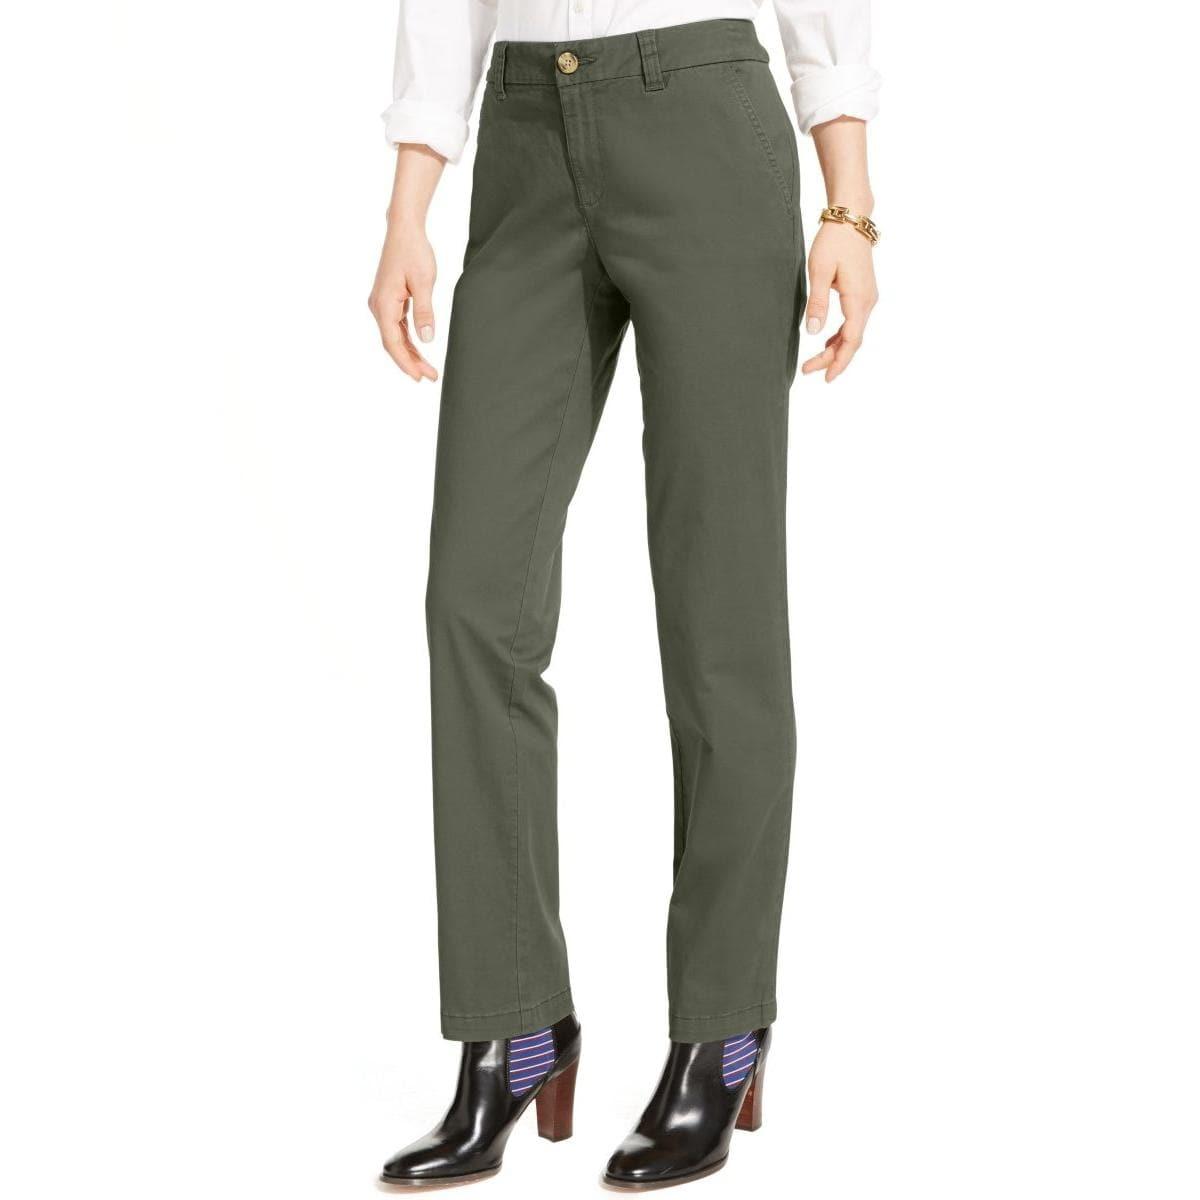 68e2bd67 Shop Tommy Hilfiger Womens Montauk Chino Pants Straight Stretch ...